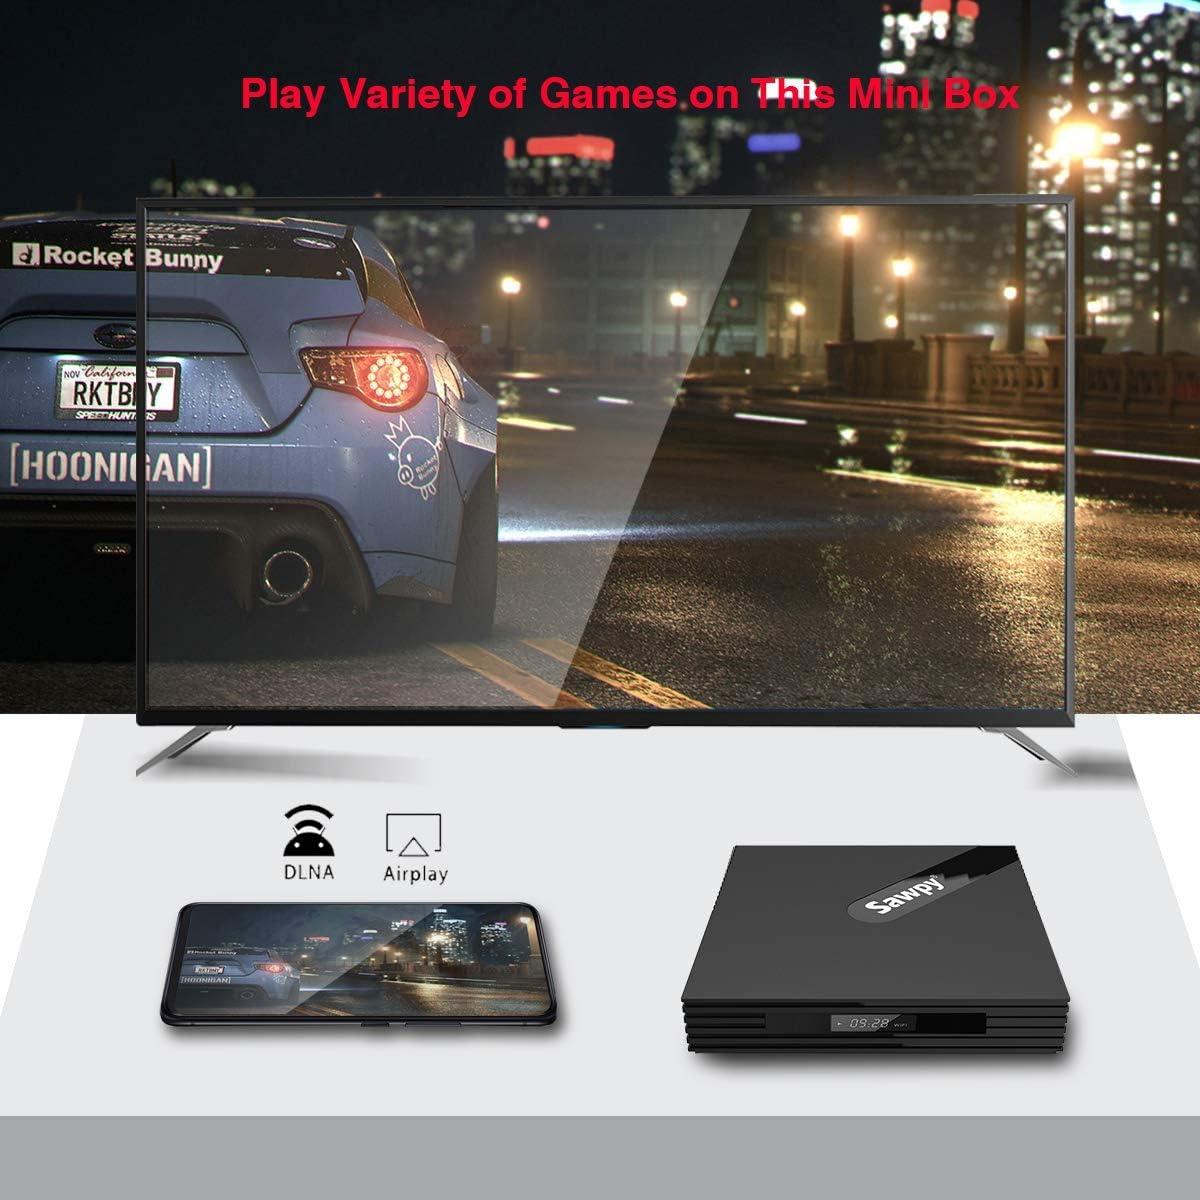 Sawpy A95XF2R Android 9.0 tv Box 2GB ram RK3318 16GB ROM 4K 2.4GHz/&5GHz Dual WiFi Bluetooth 4.2 Smart TV Box 64bit Quad-core Cortex-A53